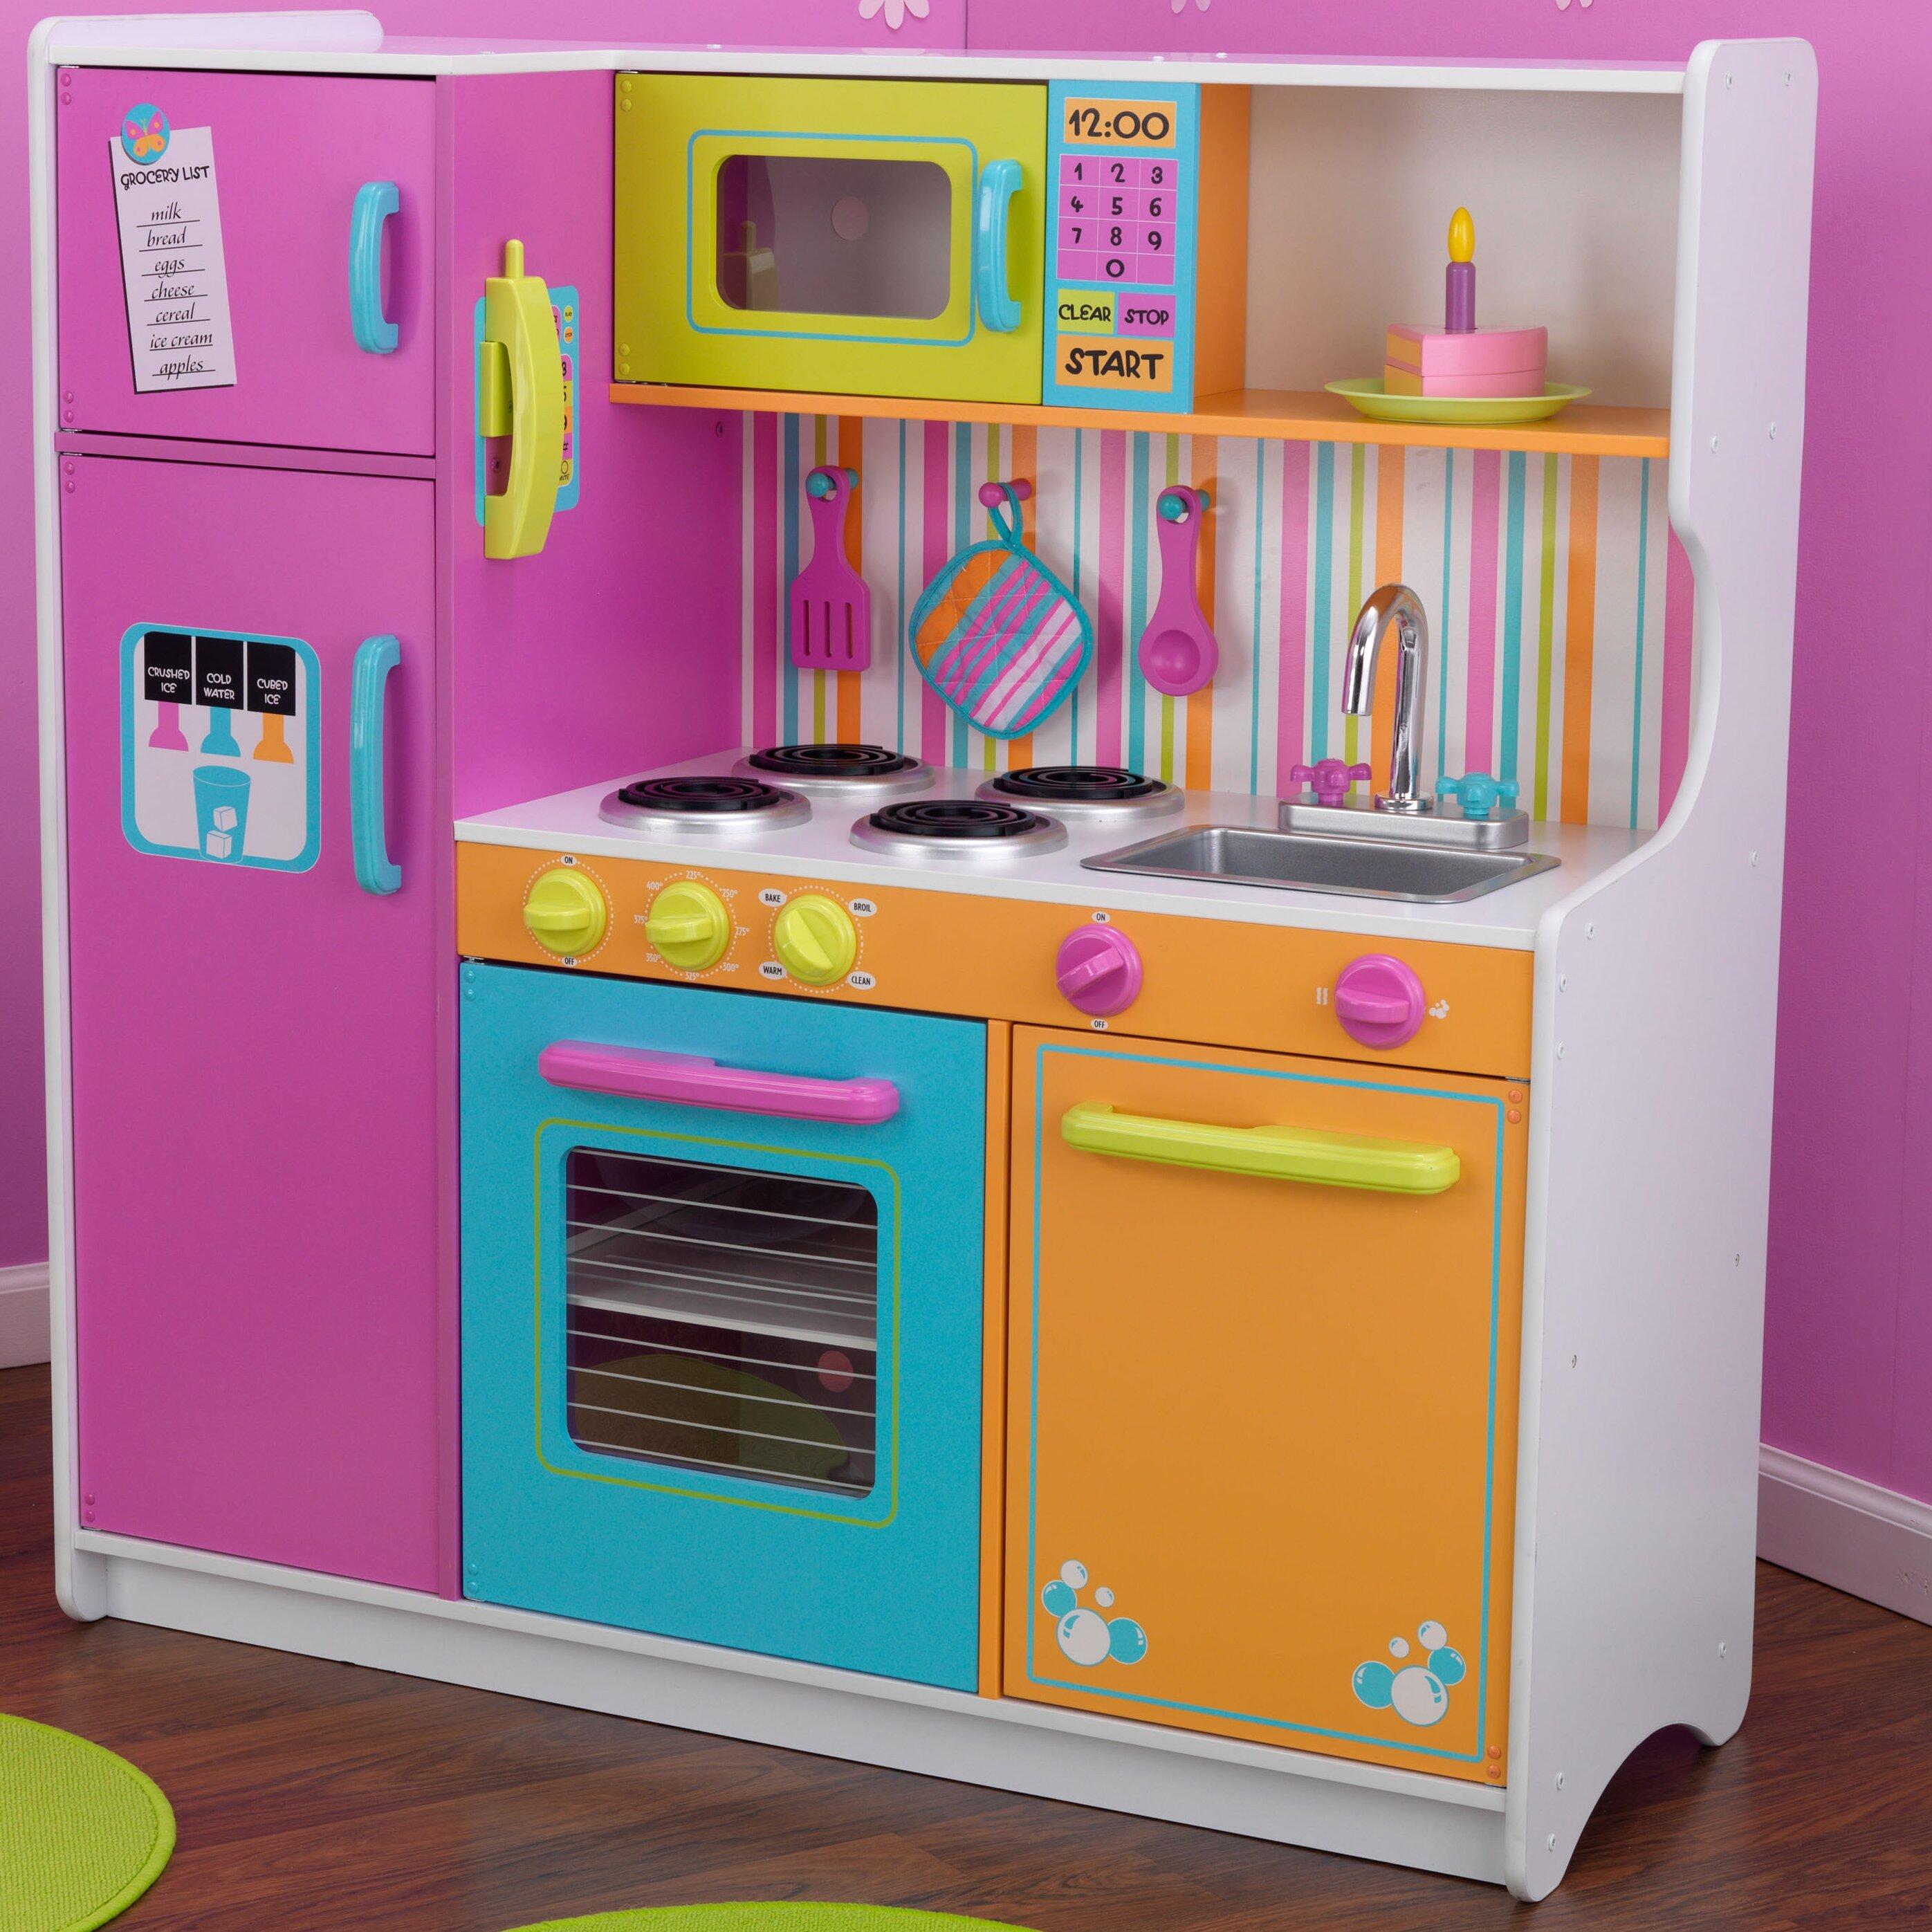 Ordinary Kidkraft Bright Kitchen Accessories Part - 6: Kidkraft Deluxe Big Amp Bright Kitchen Play Set Amp Reviews